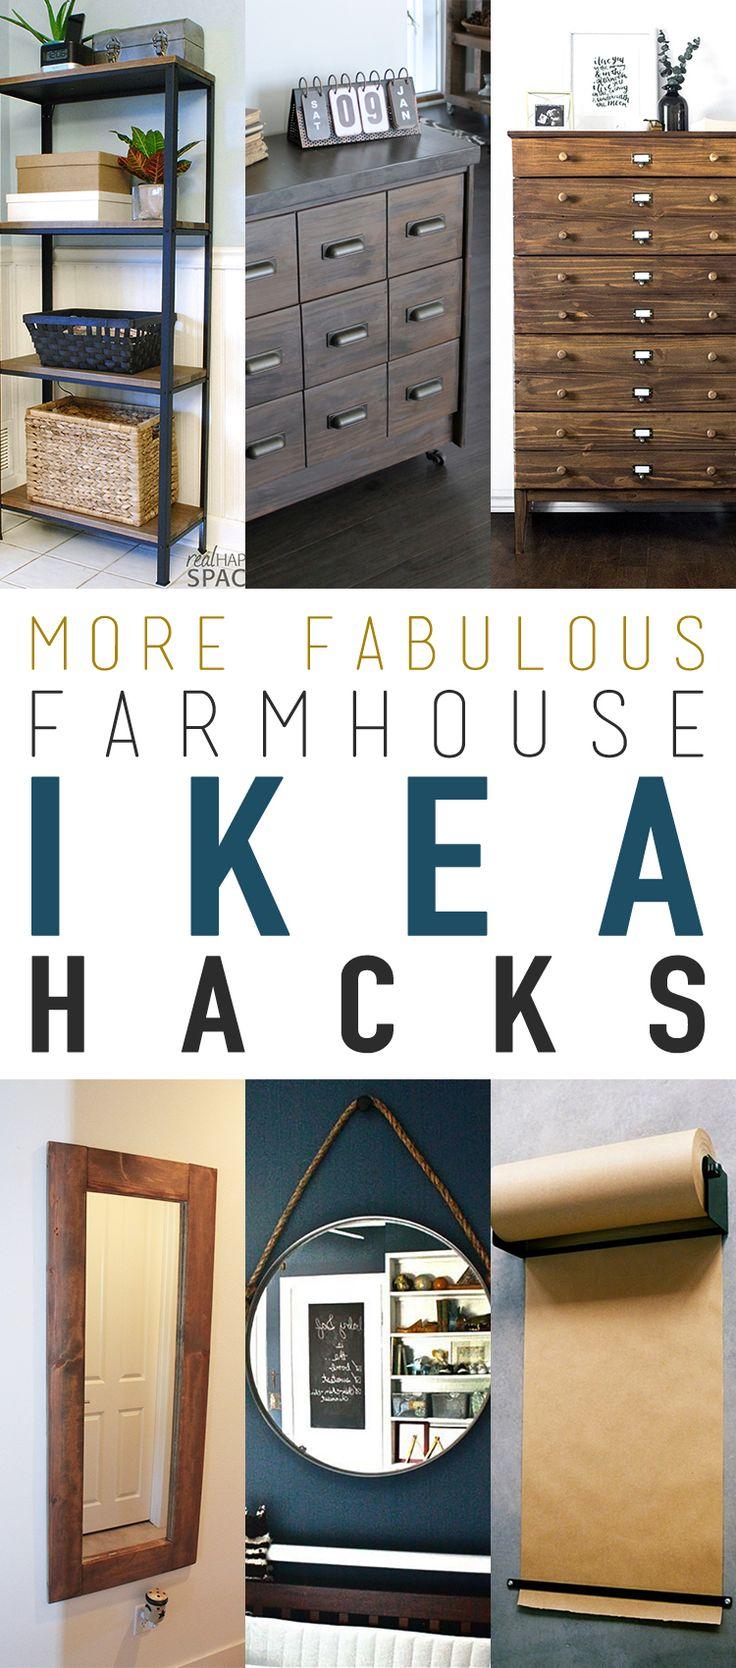 More Fabulous Farmhouse IKEA Hacks!